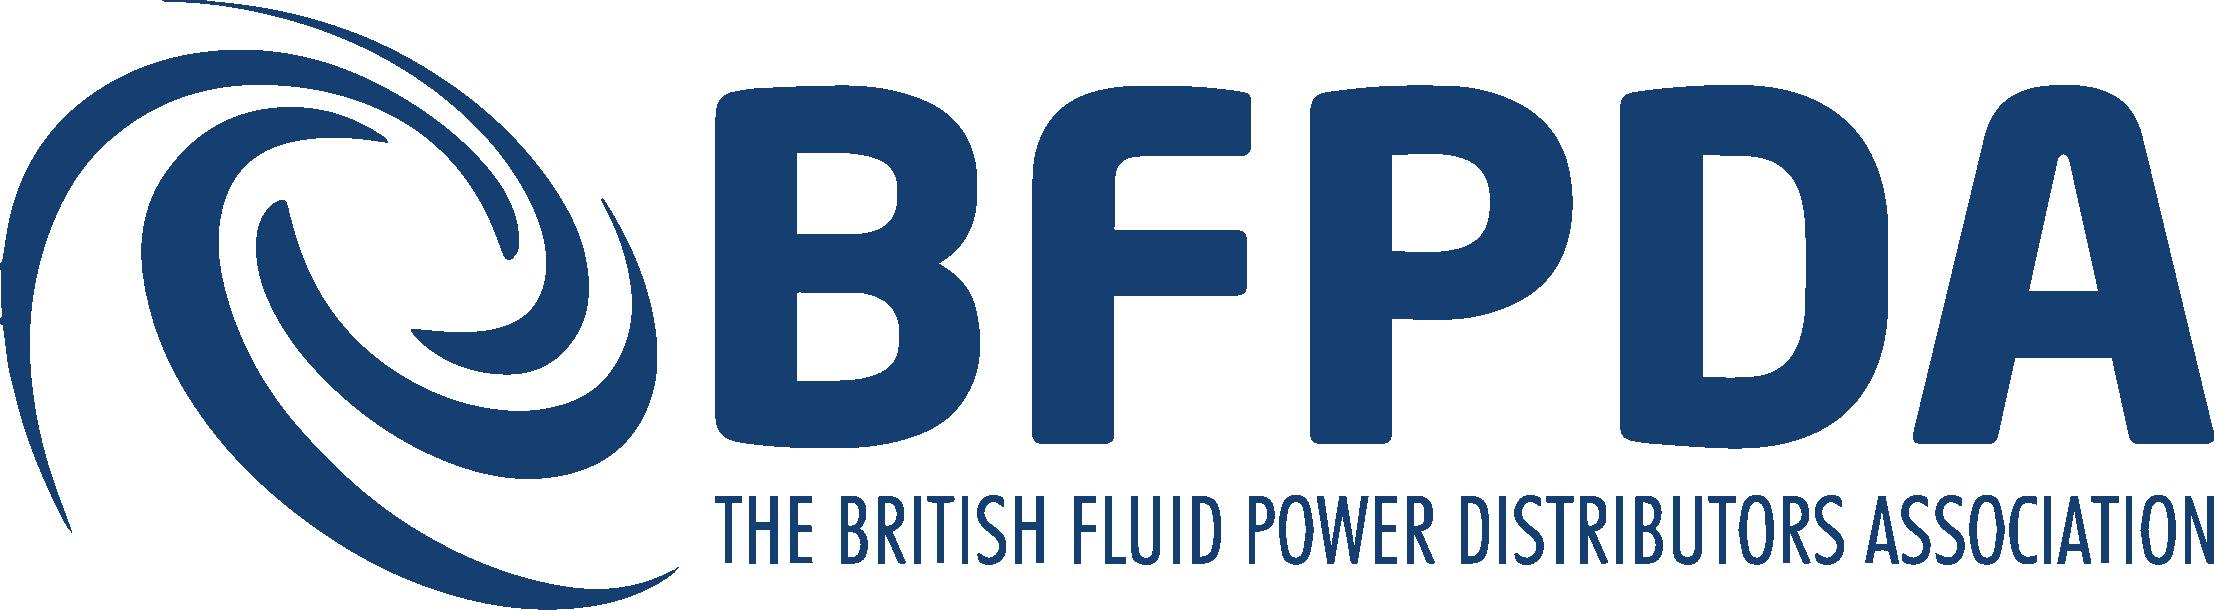 BFPDA-Logo